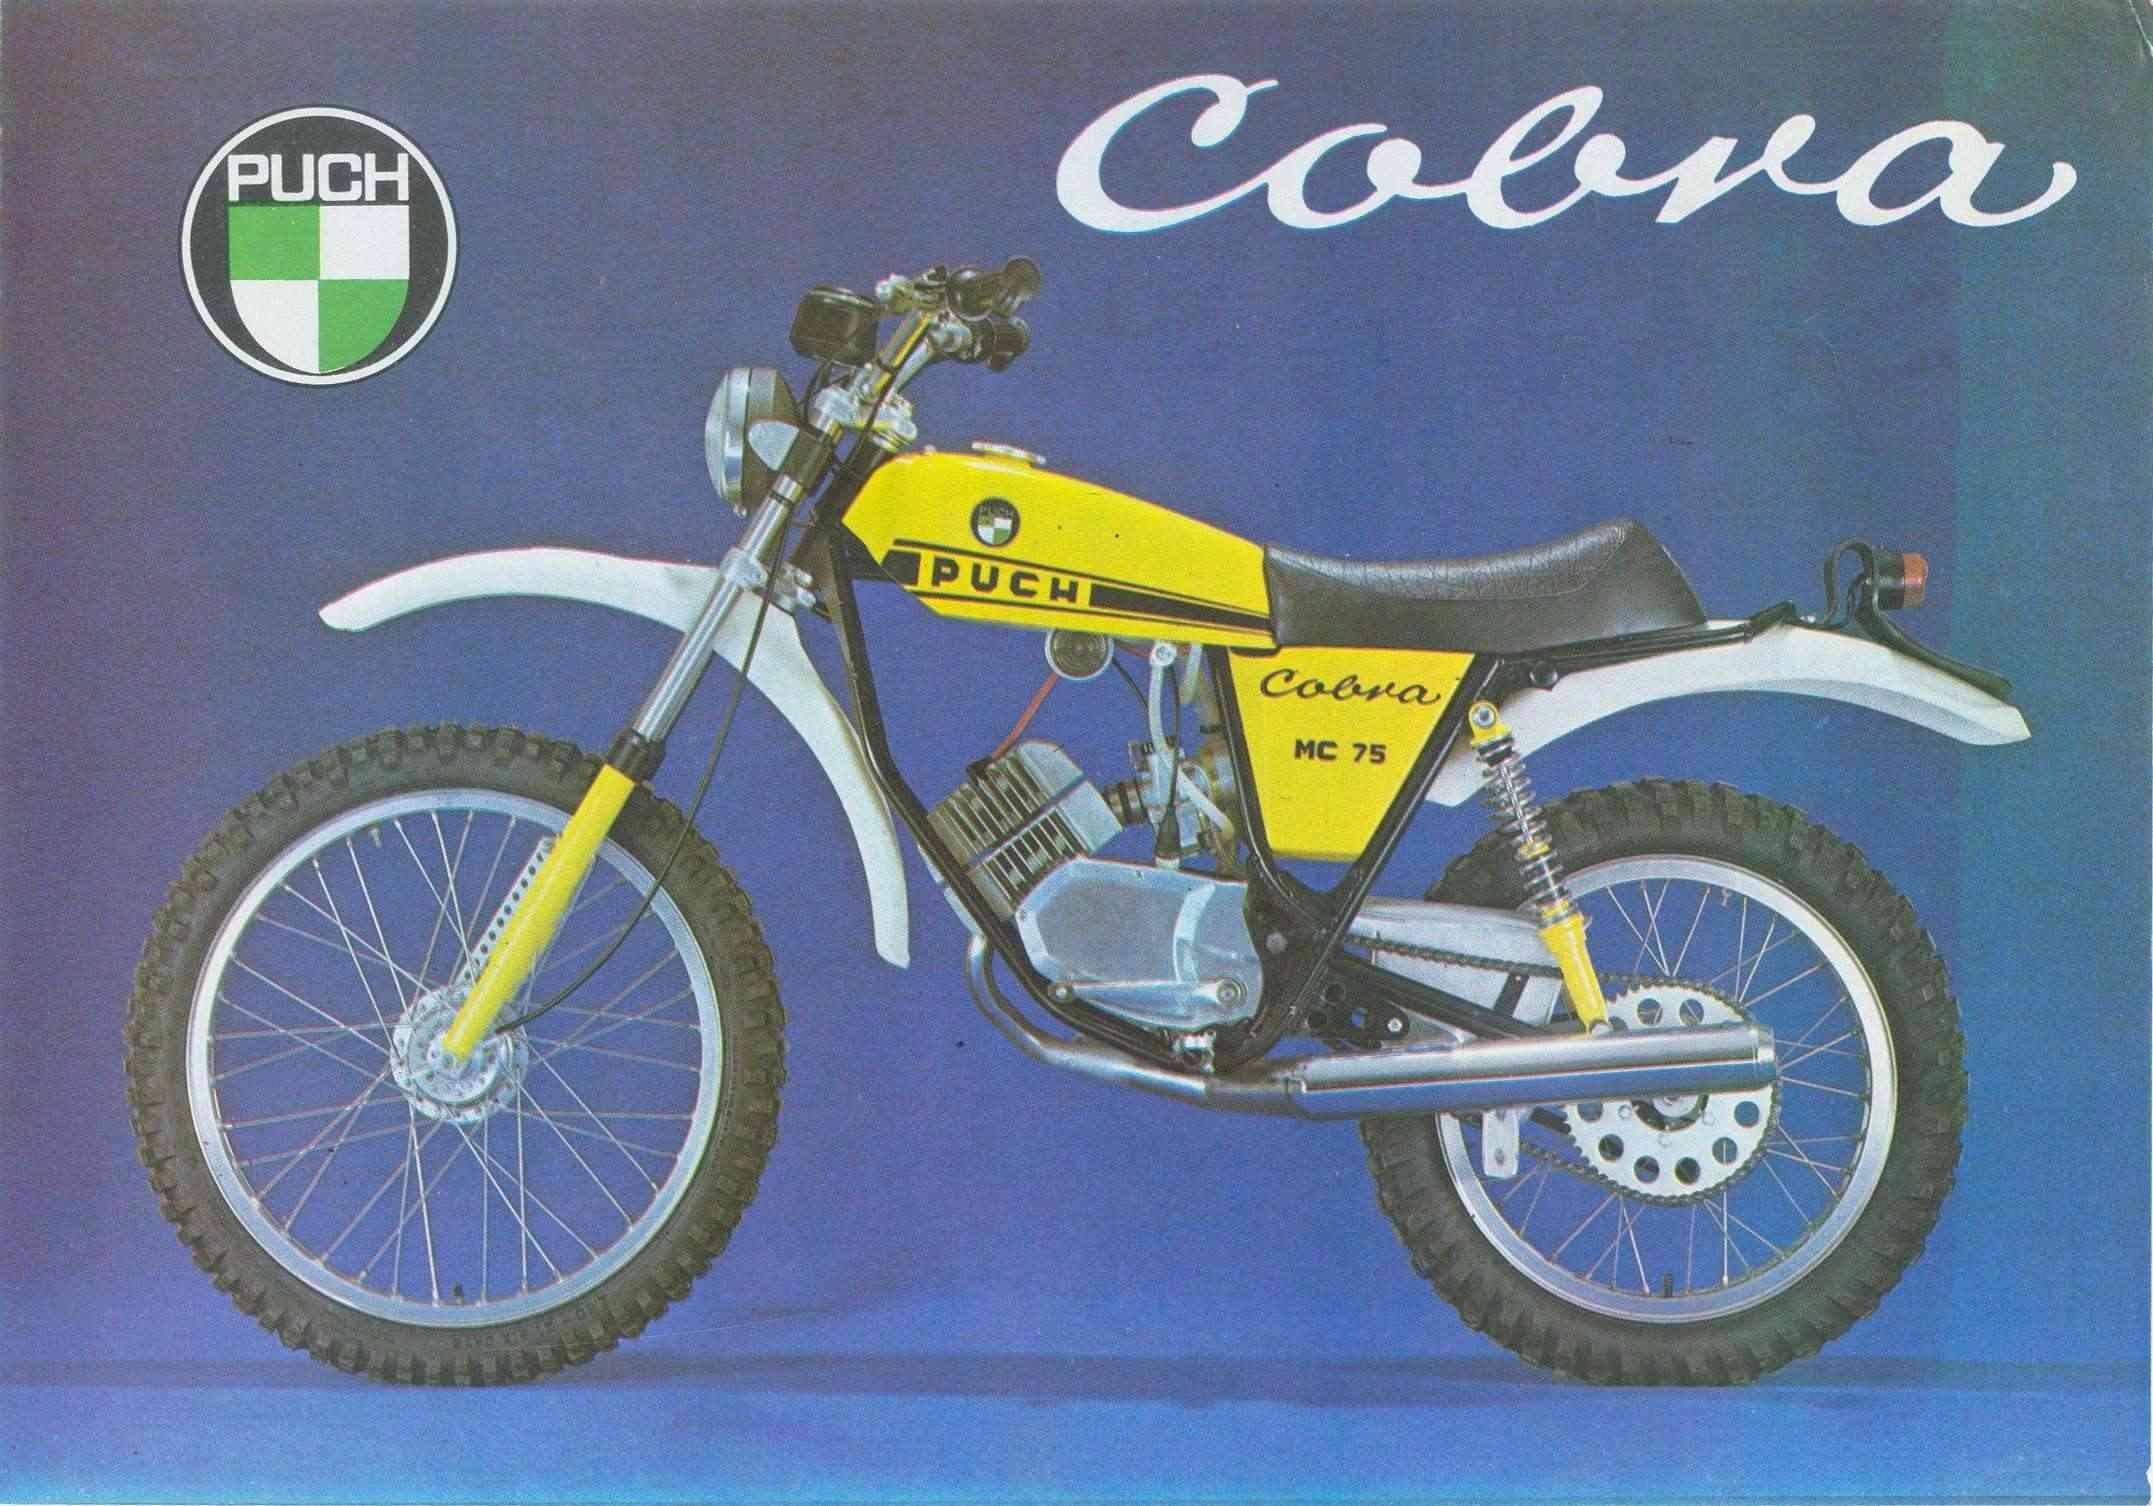 Puch Cobra